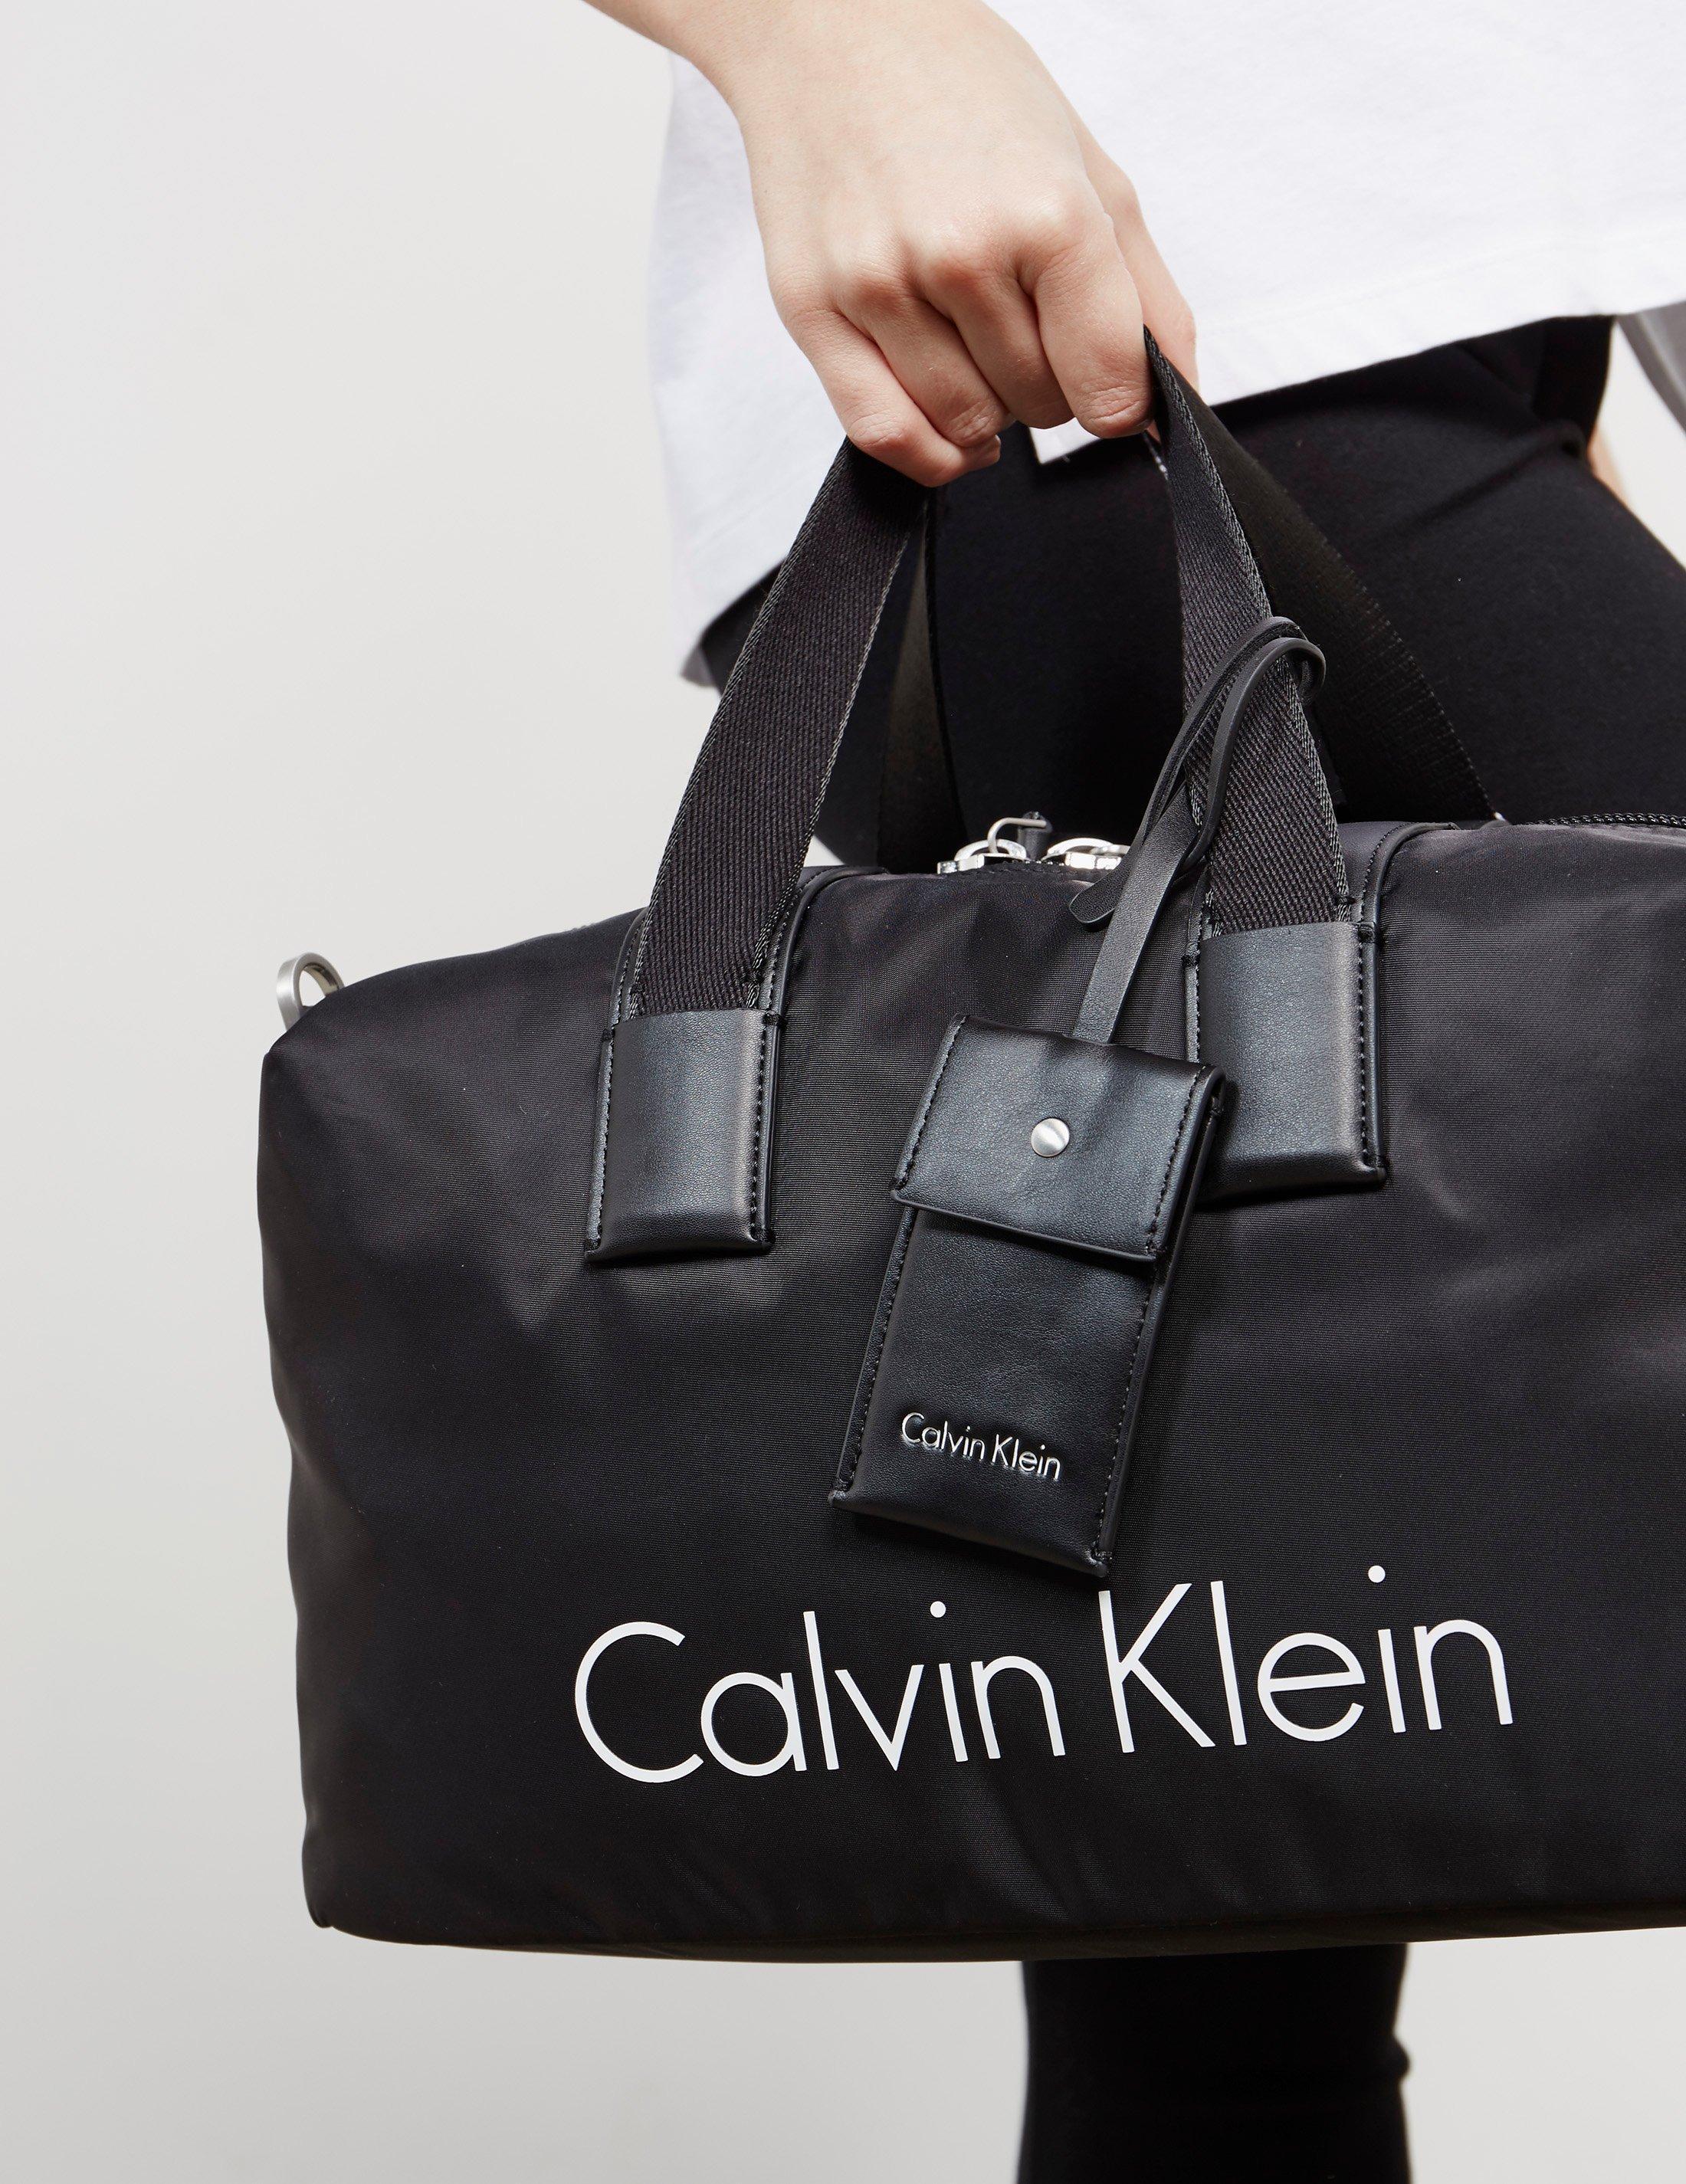 8e2094e5b4d CALVIN KLEIN 205W39NYC Womens Nylon Duffle Bag Black in Black for ...